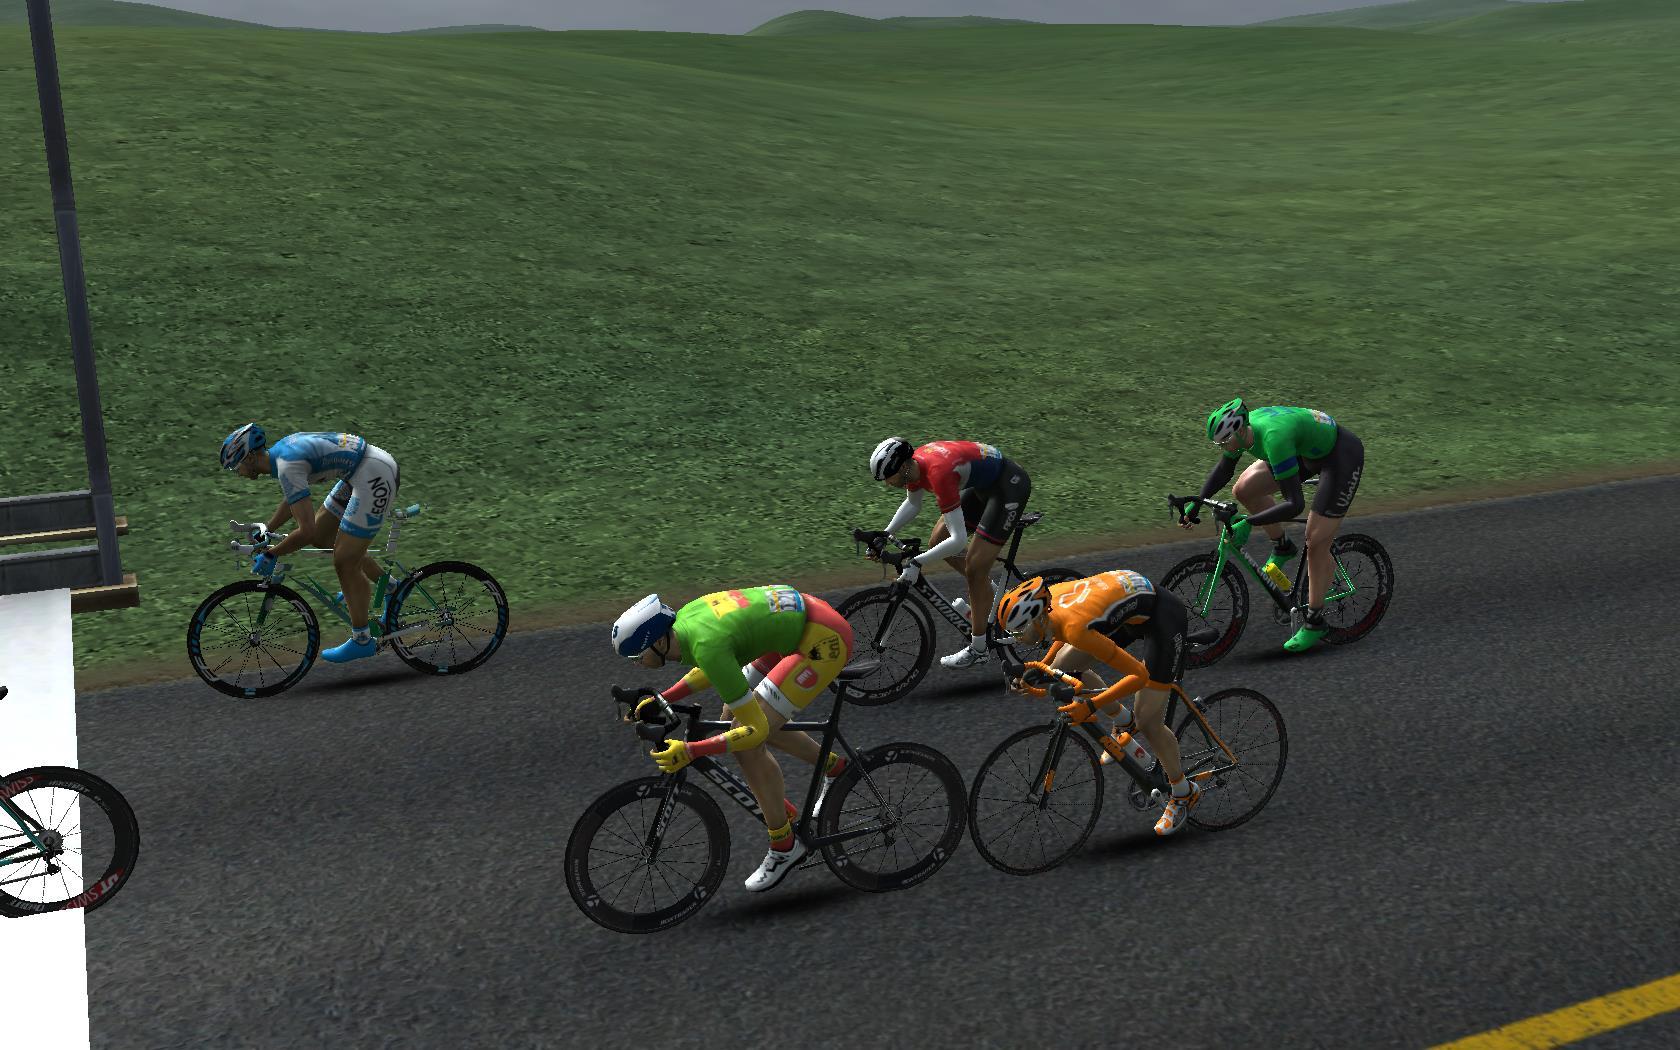 pcmdaily.com/images/mg/2018/Races/C2/USAPCC/3/PCM0012.jpg